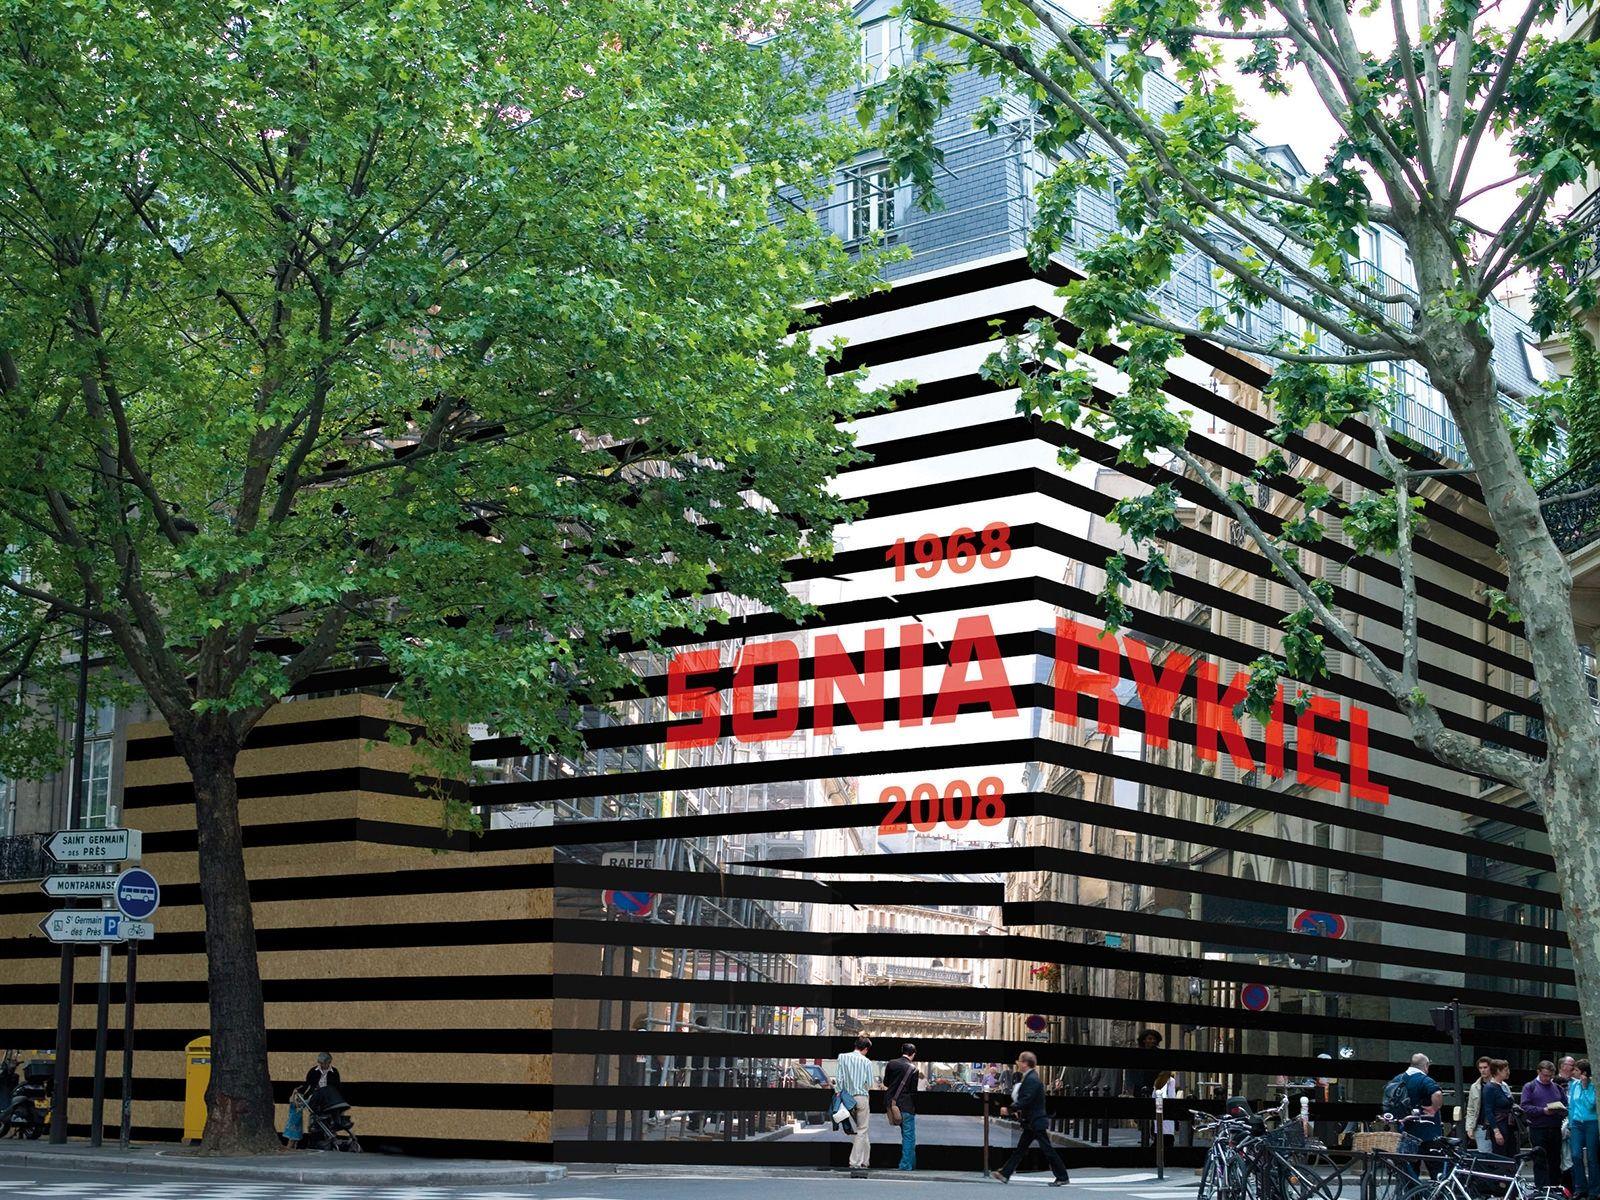 Sonia Rykiel, boutique Saint Germain, Paris, Staged by ATHEM